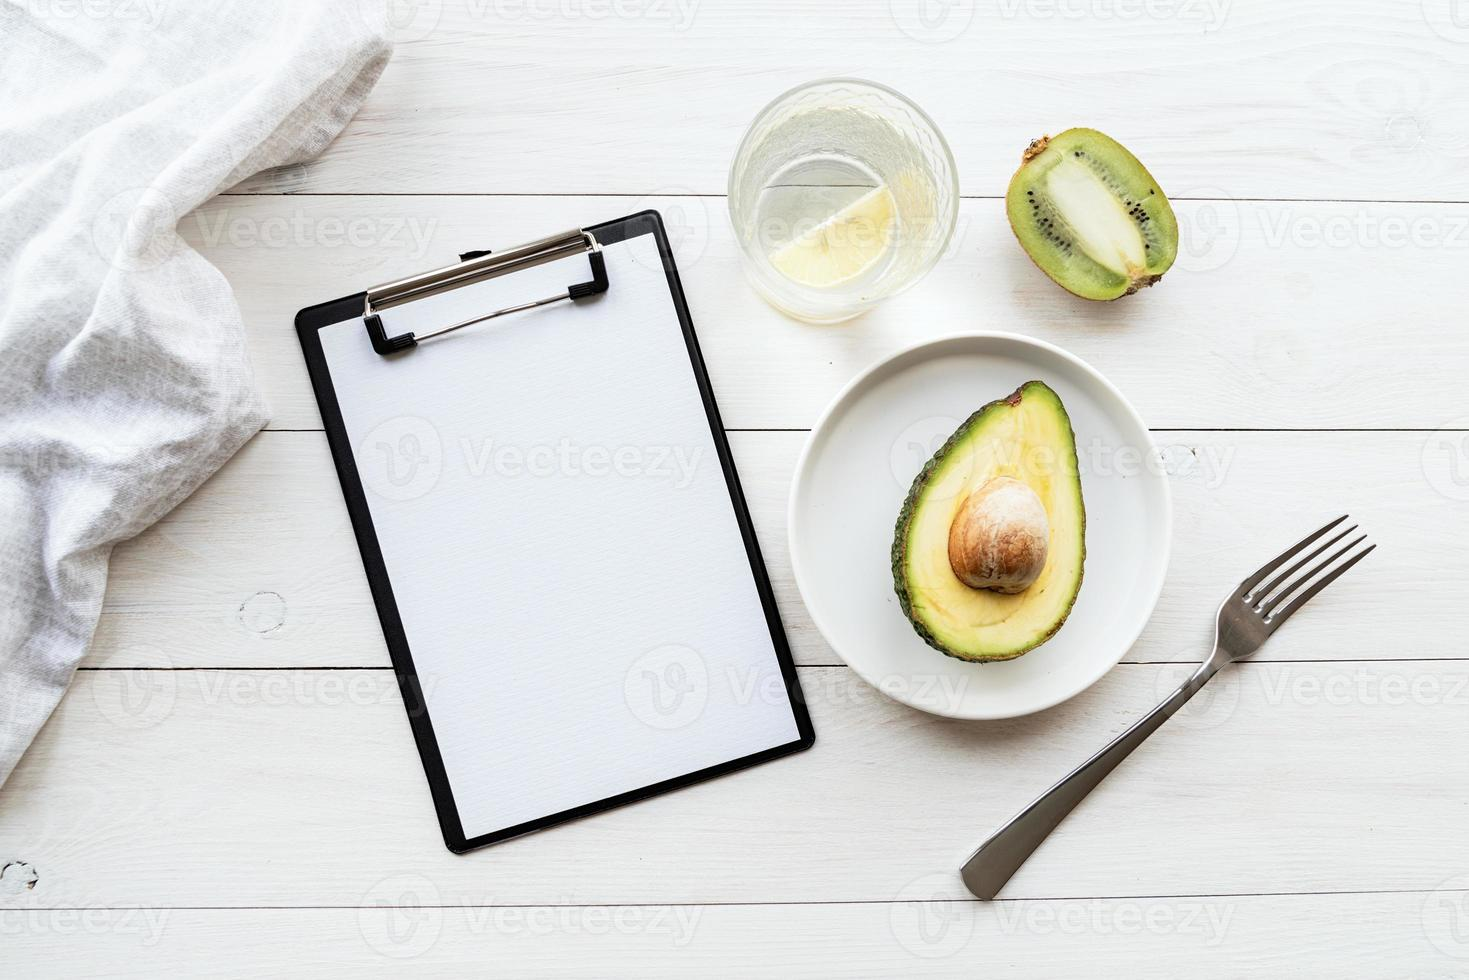 Detox plan of avocado and kiwi and blank notepad, top view flat lay photo